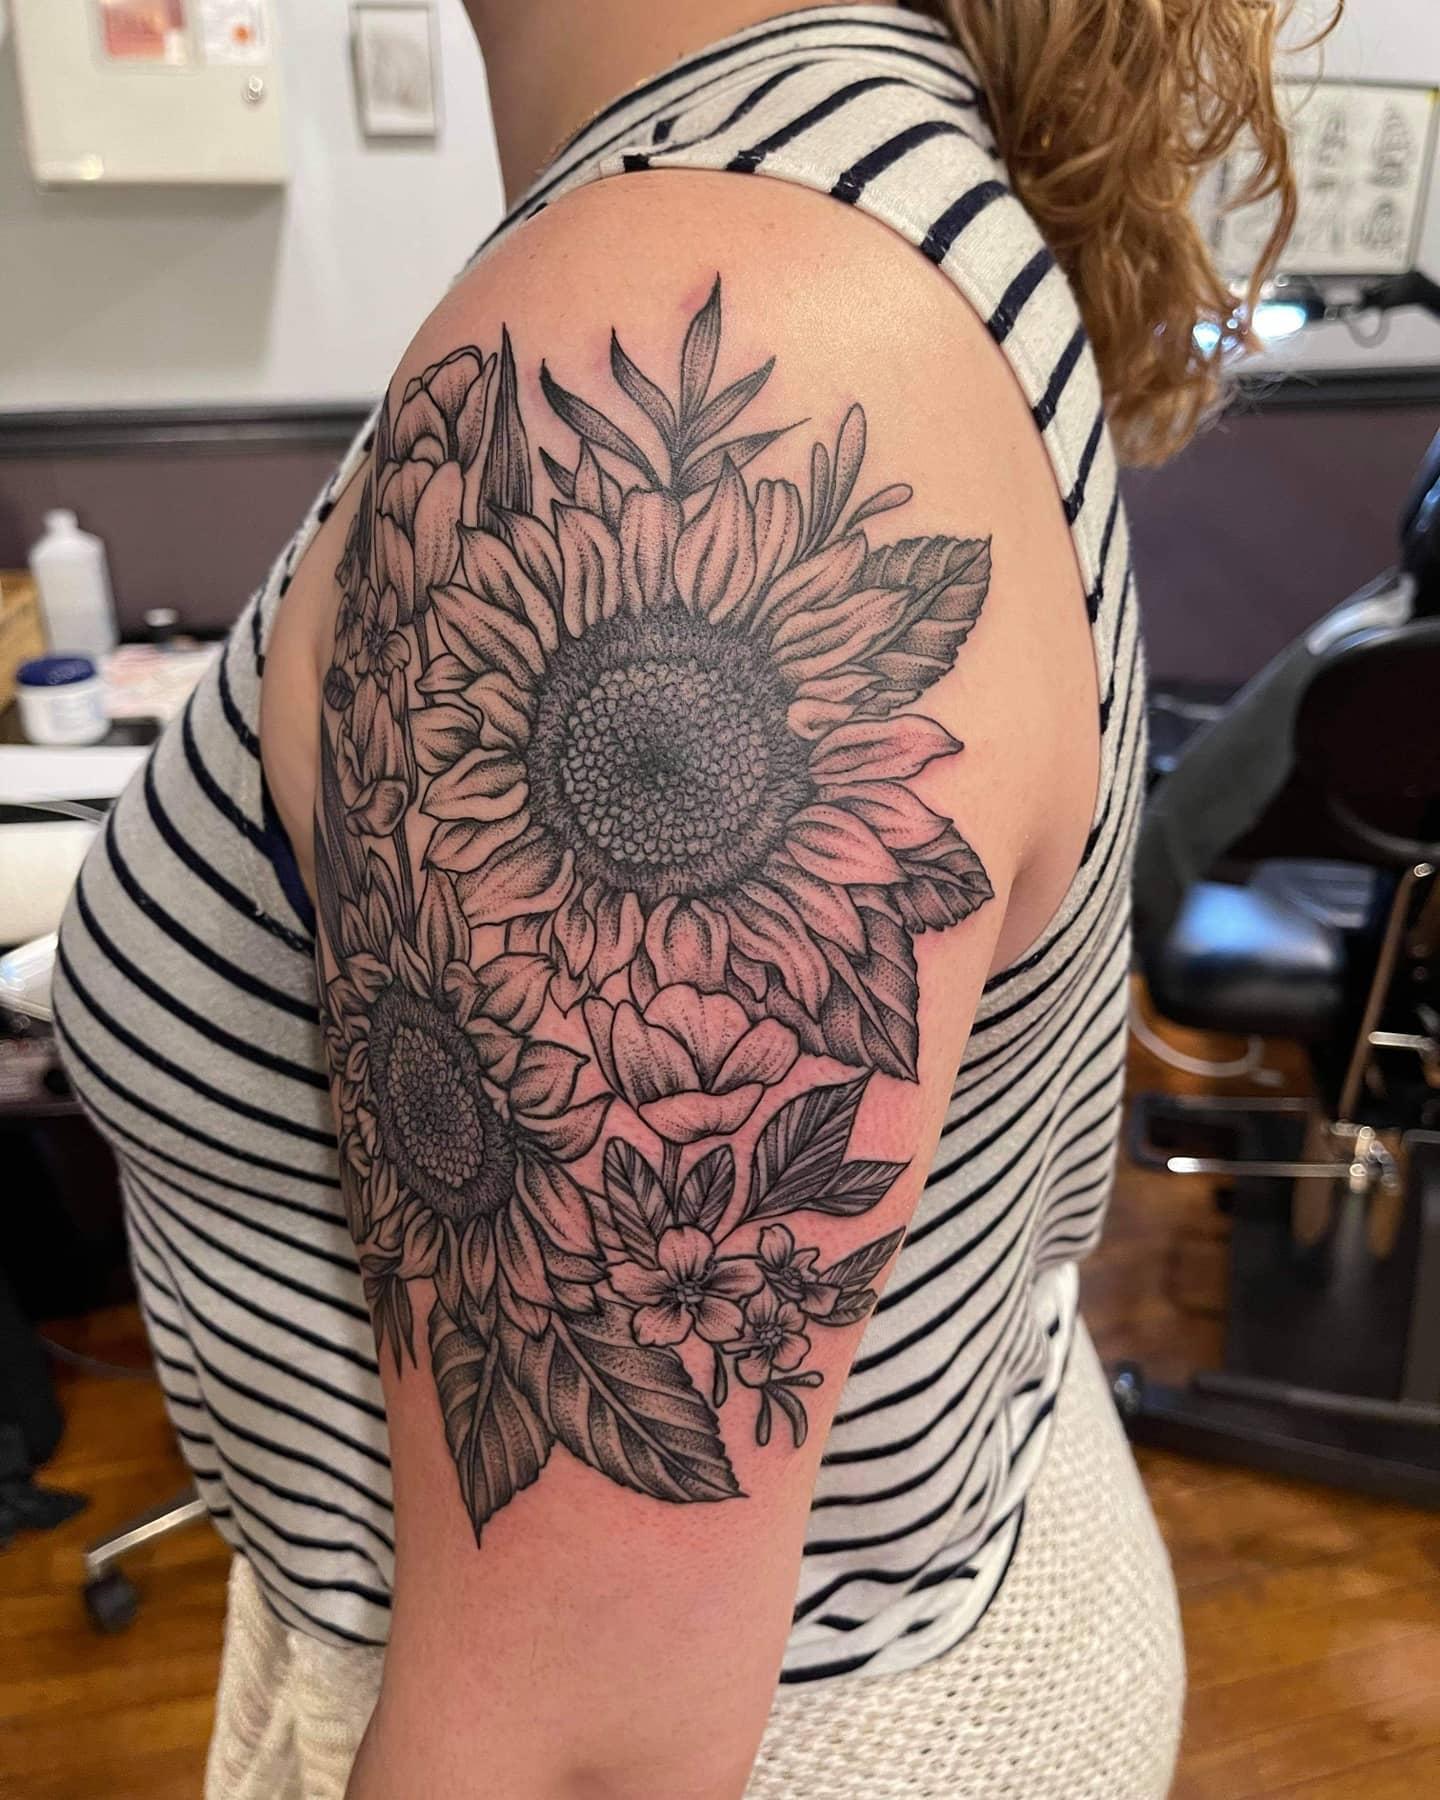 Blackwork floral by Chico Lou's Fine tattoos studio in Athens Georgia GA. Artist - Jess Clark